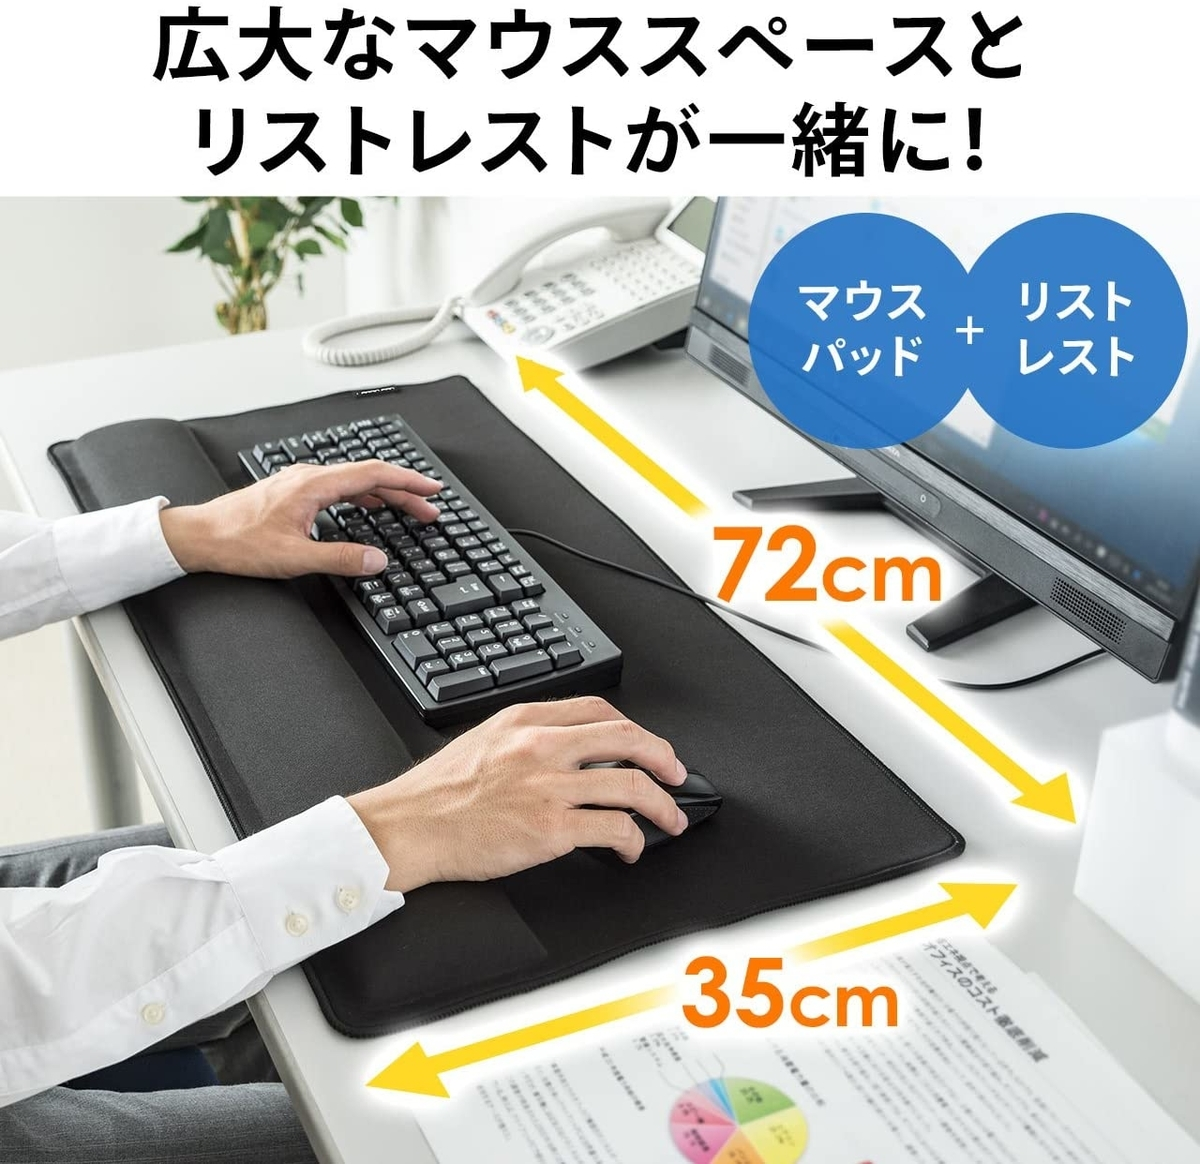 f:id:tsukasamochi:20201108185611j:plain